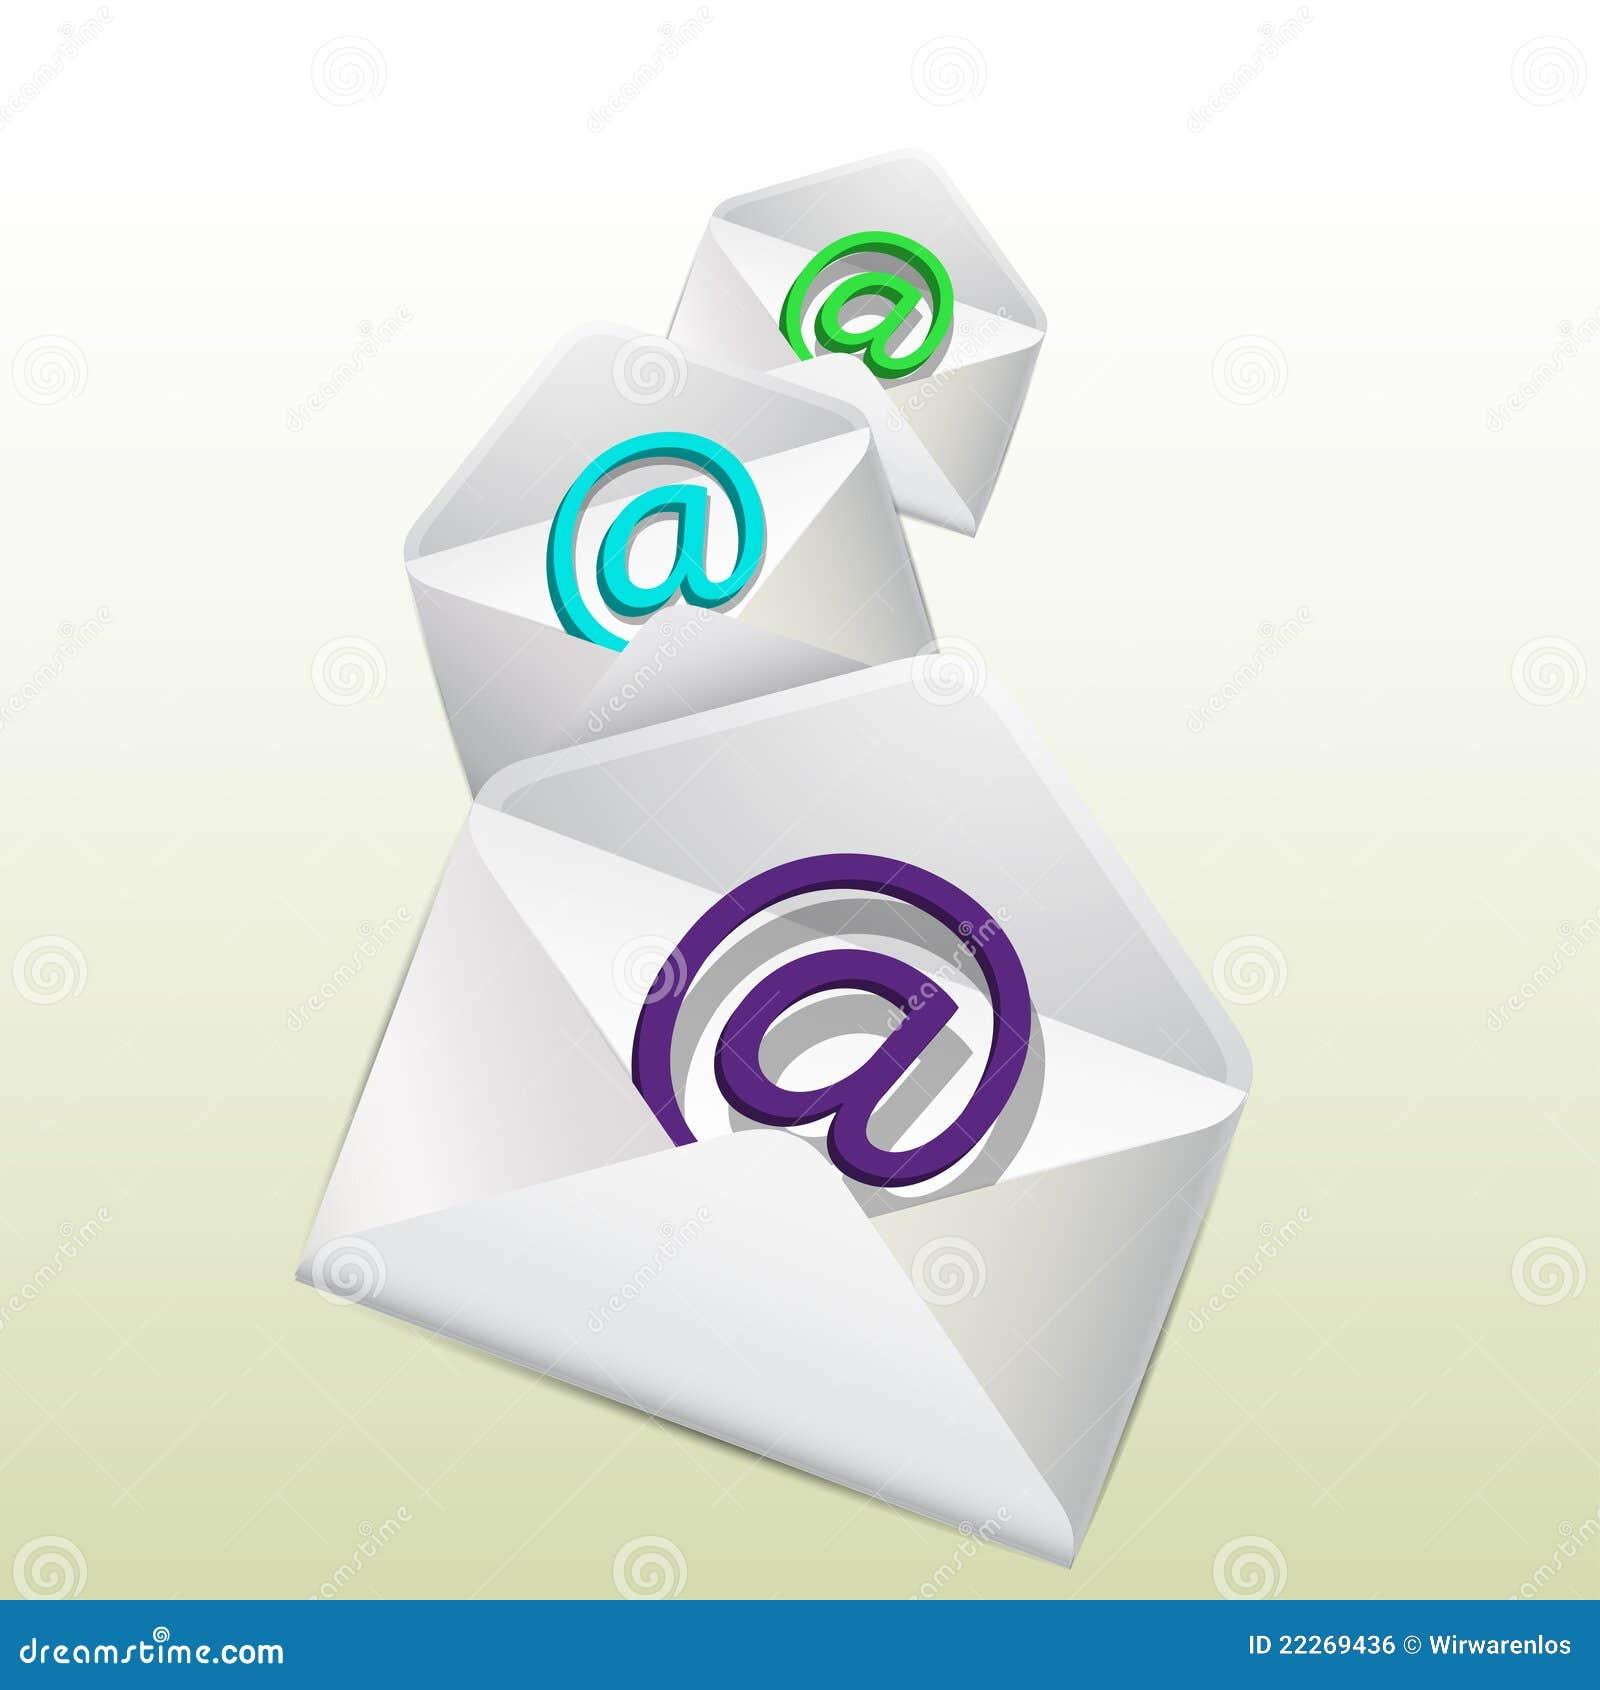 Logotipos do email dentro dos envelopes.